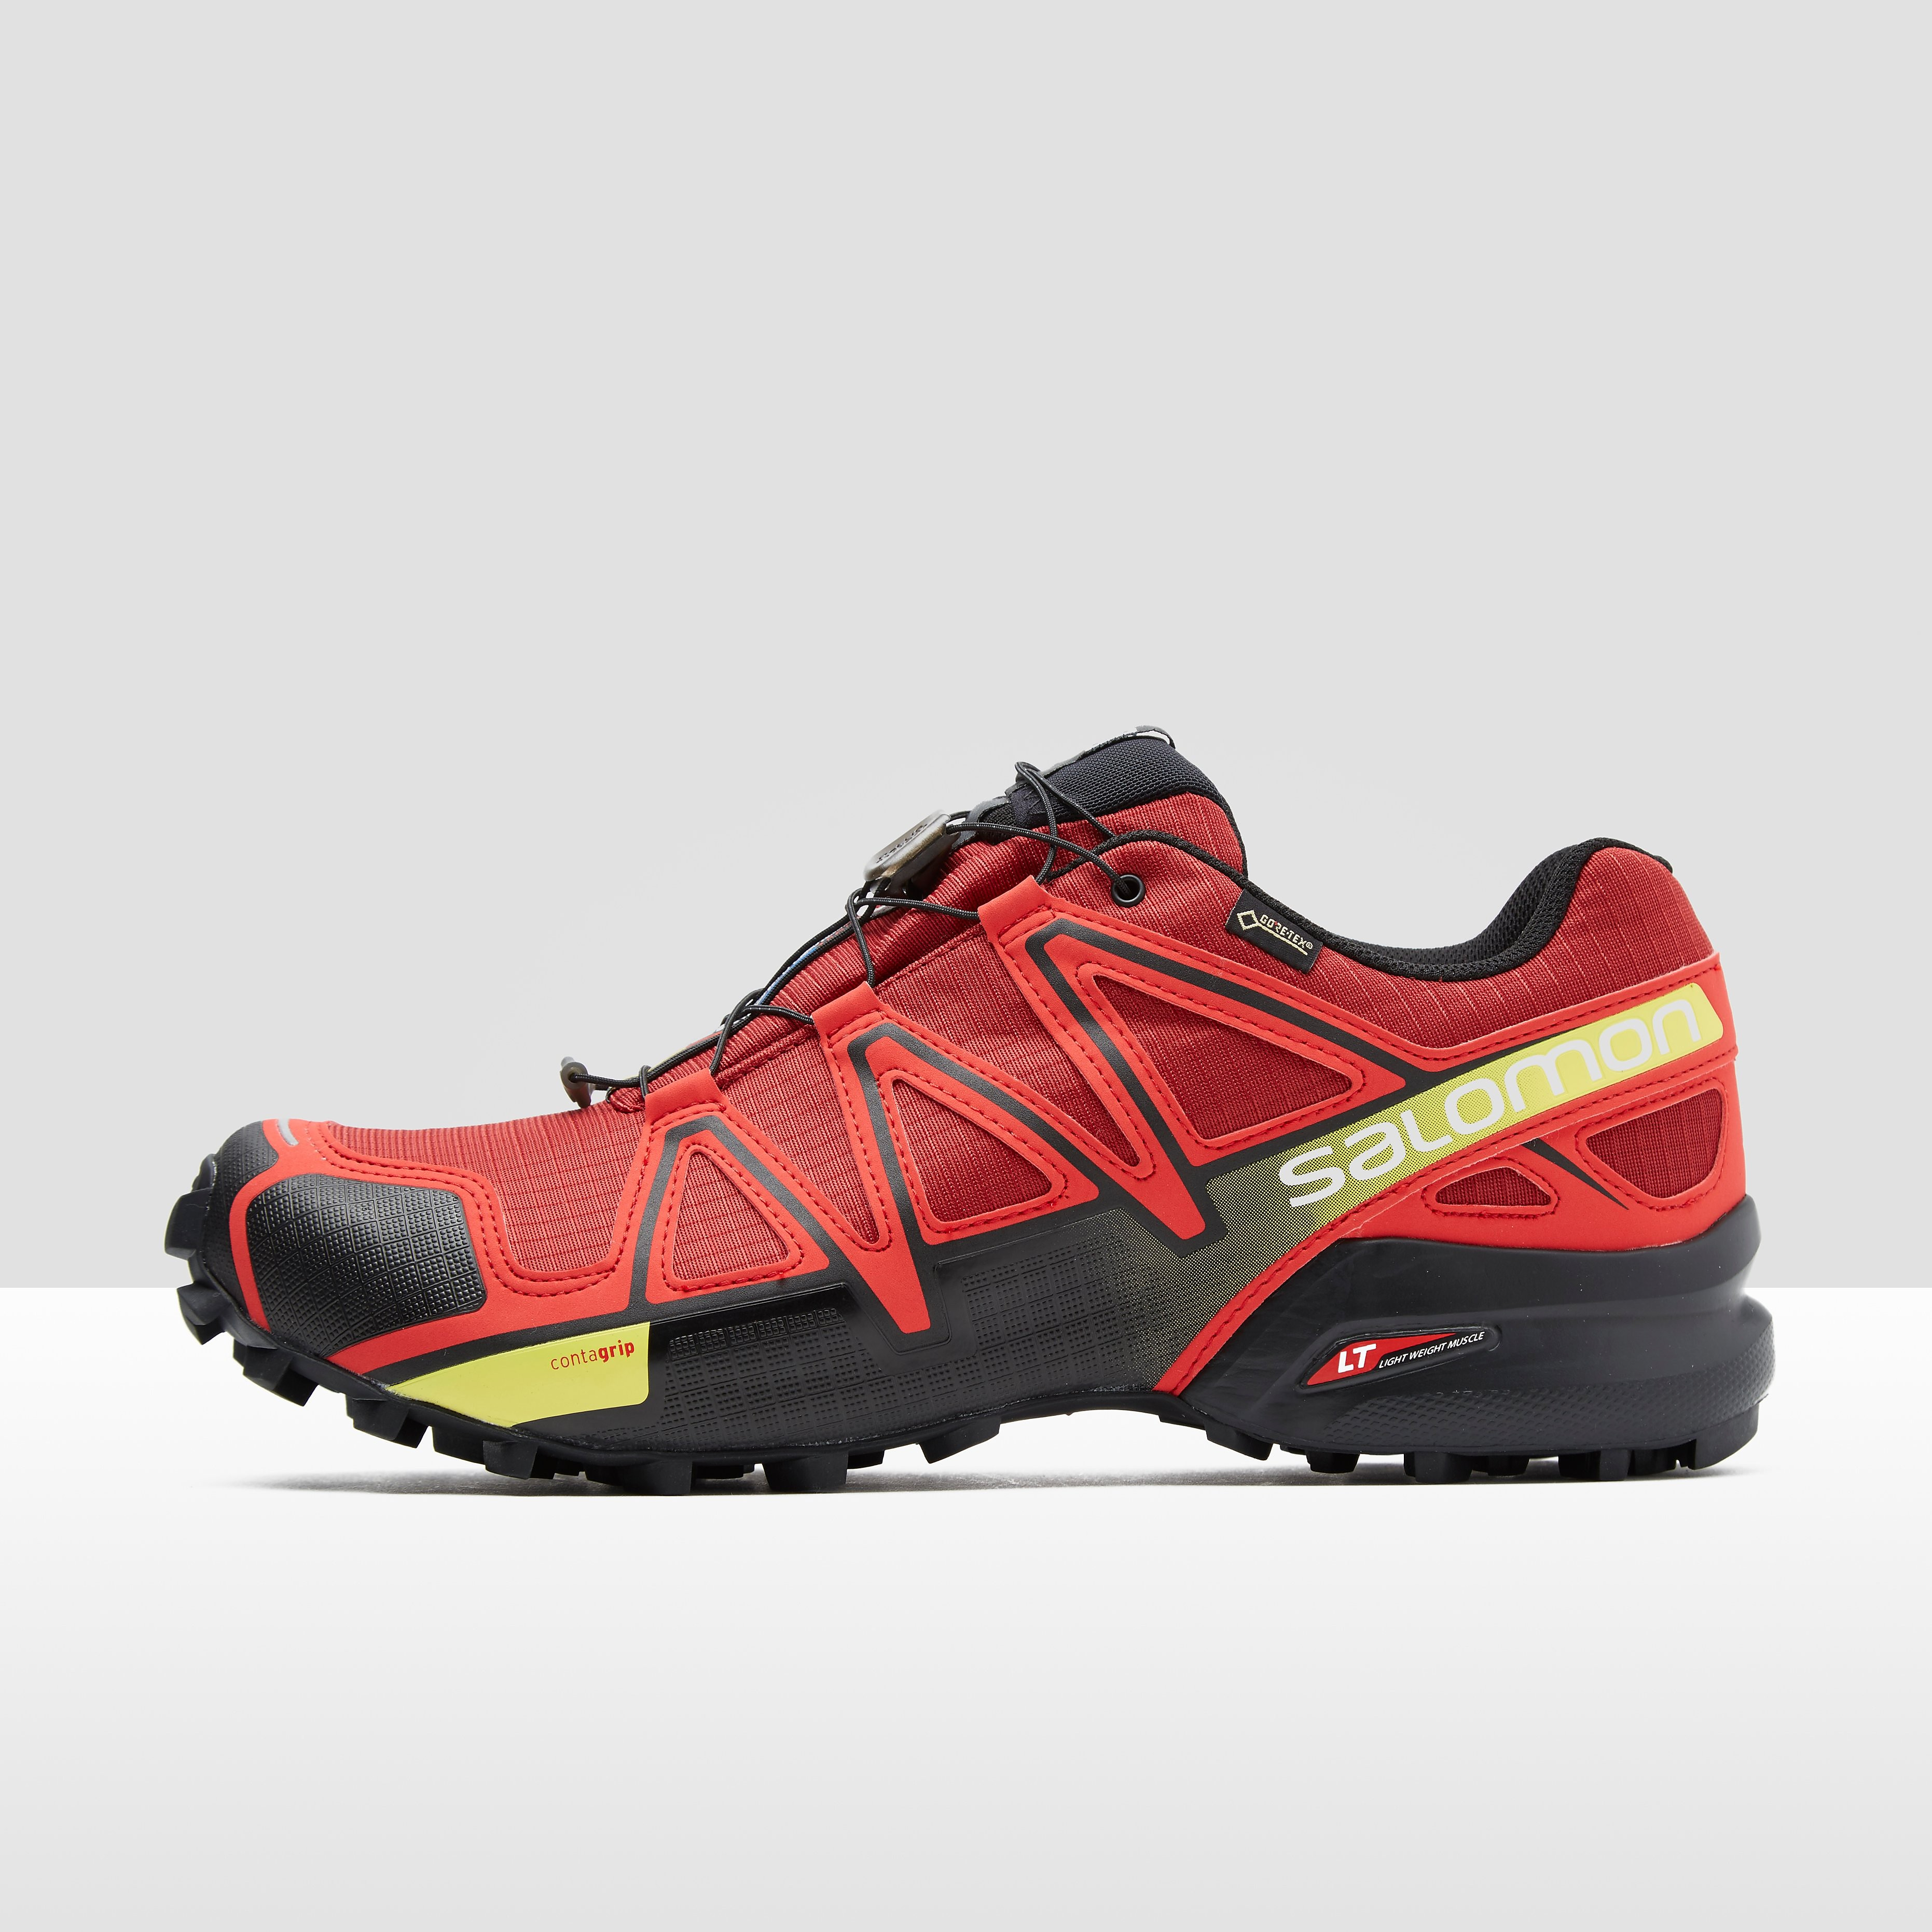 Salomon Speedcross 4 CS GTX Men's Trail Running Shoes